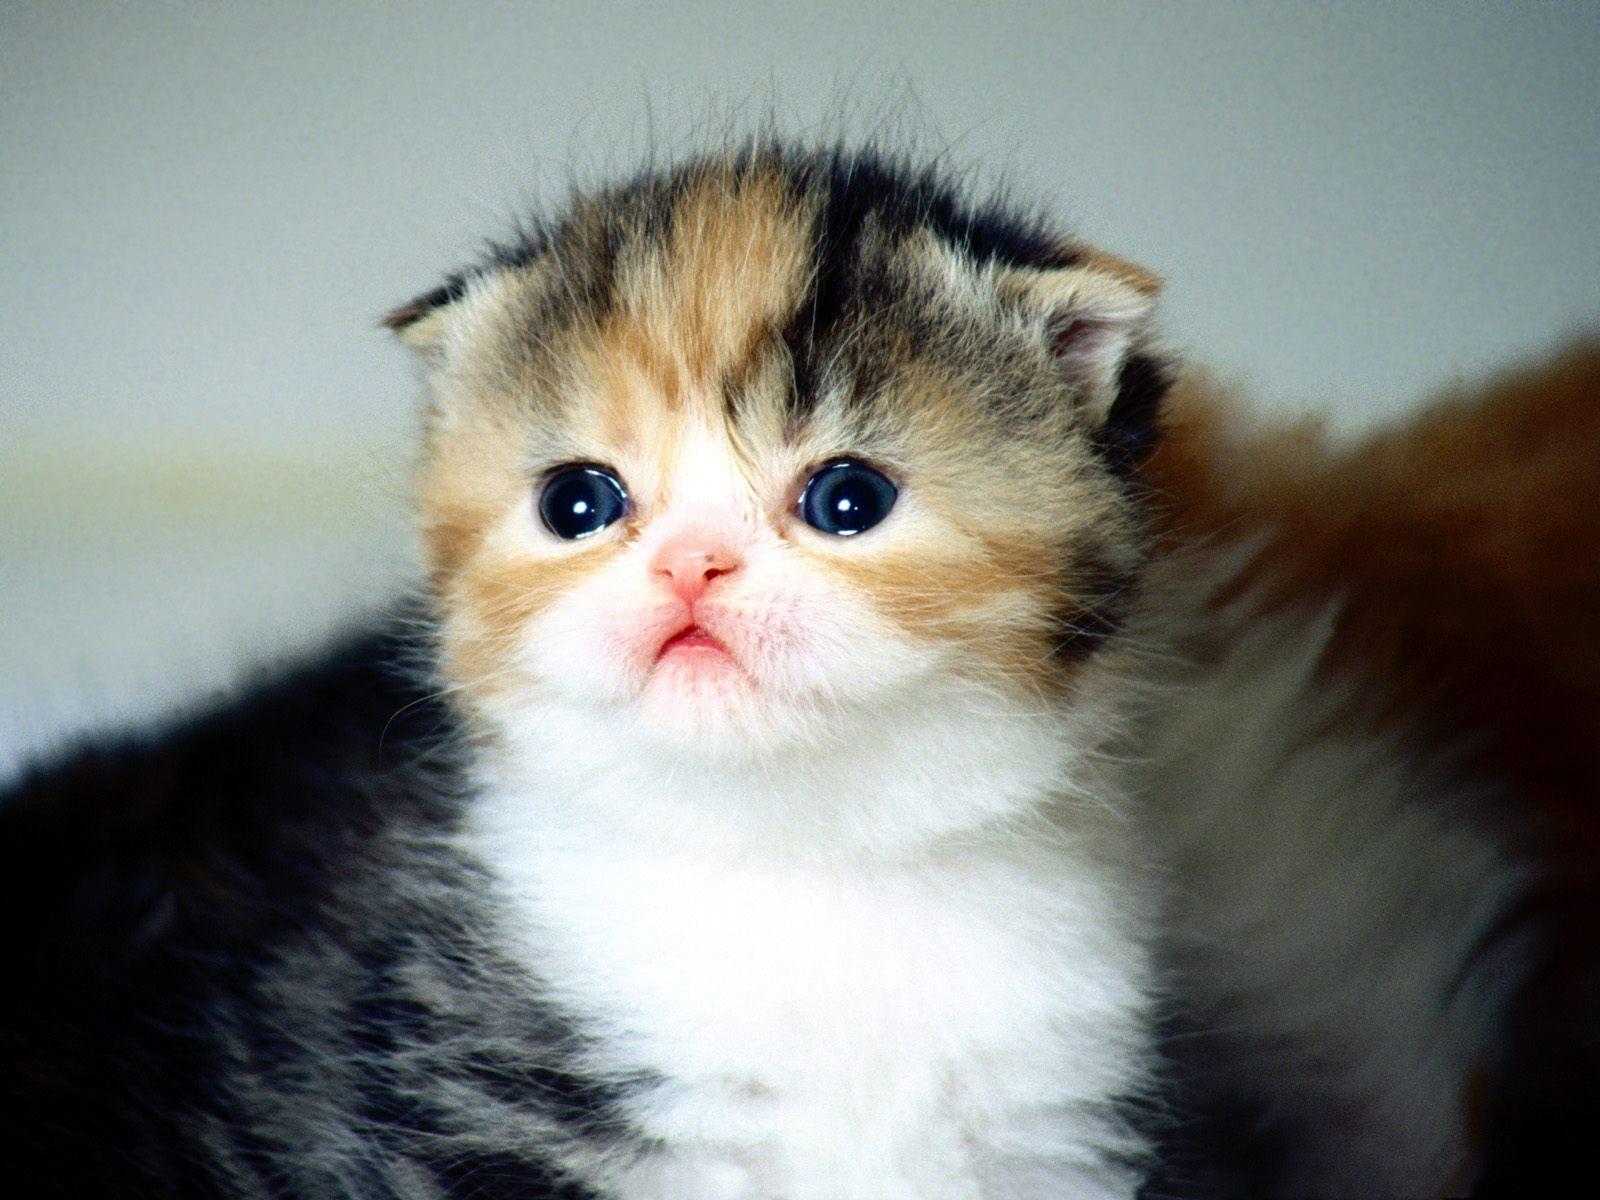 Kitty Cat Kitten Cute Baby Wild Cats Hd Cats Wallpapers Hd 1600x1200